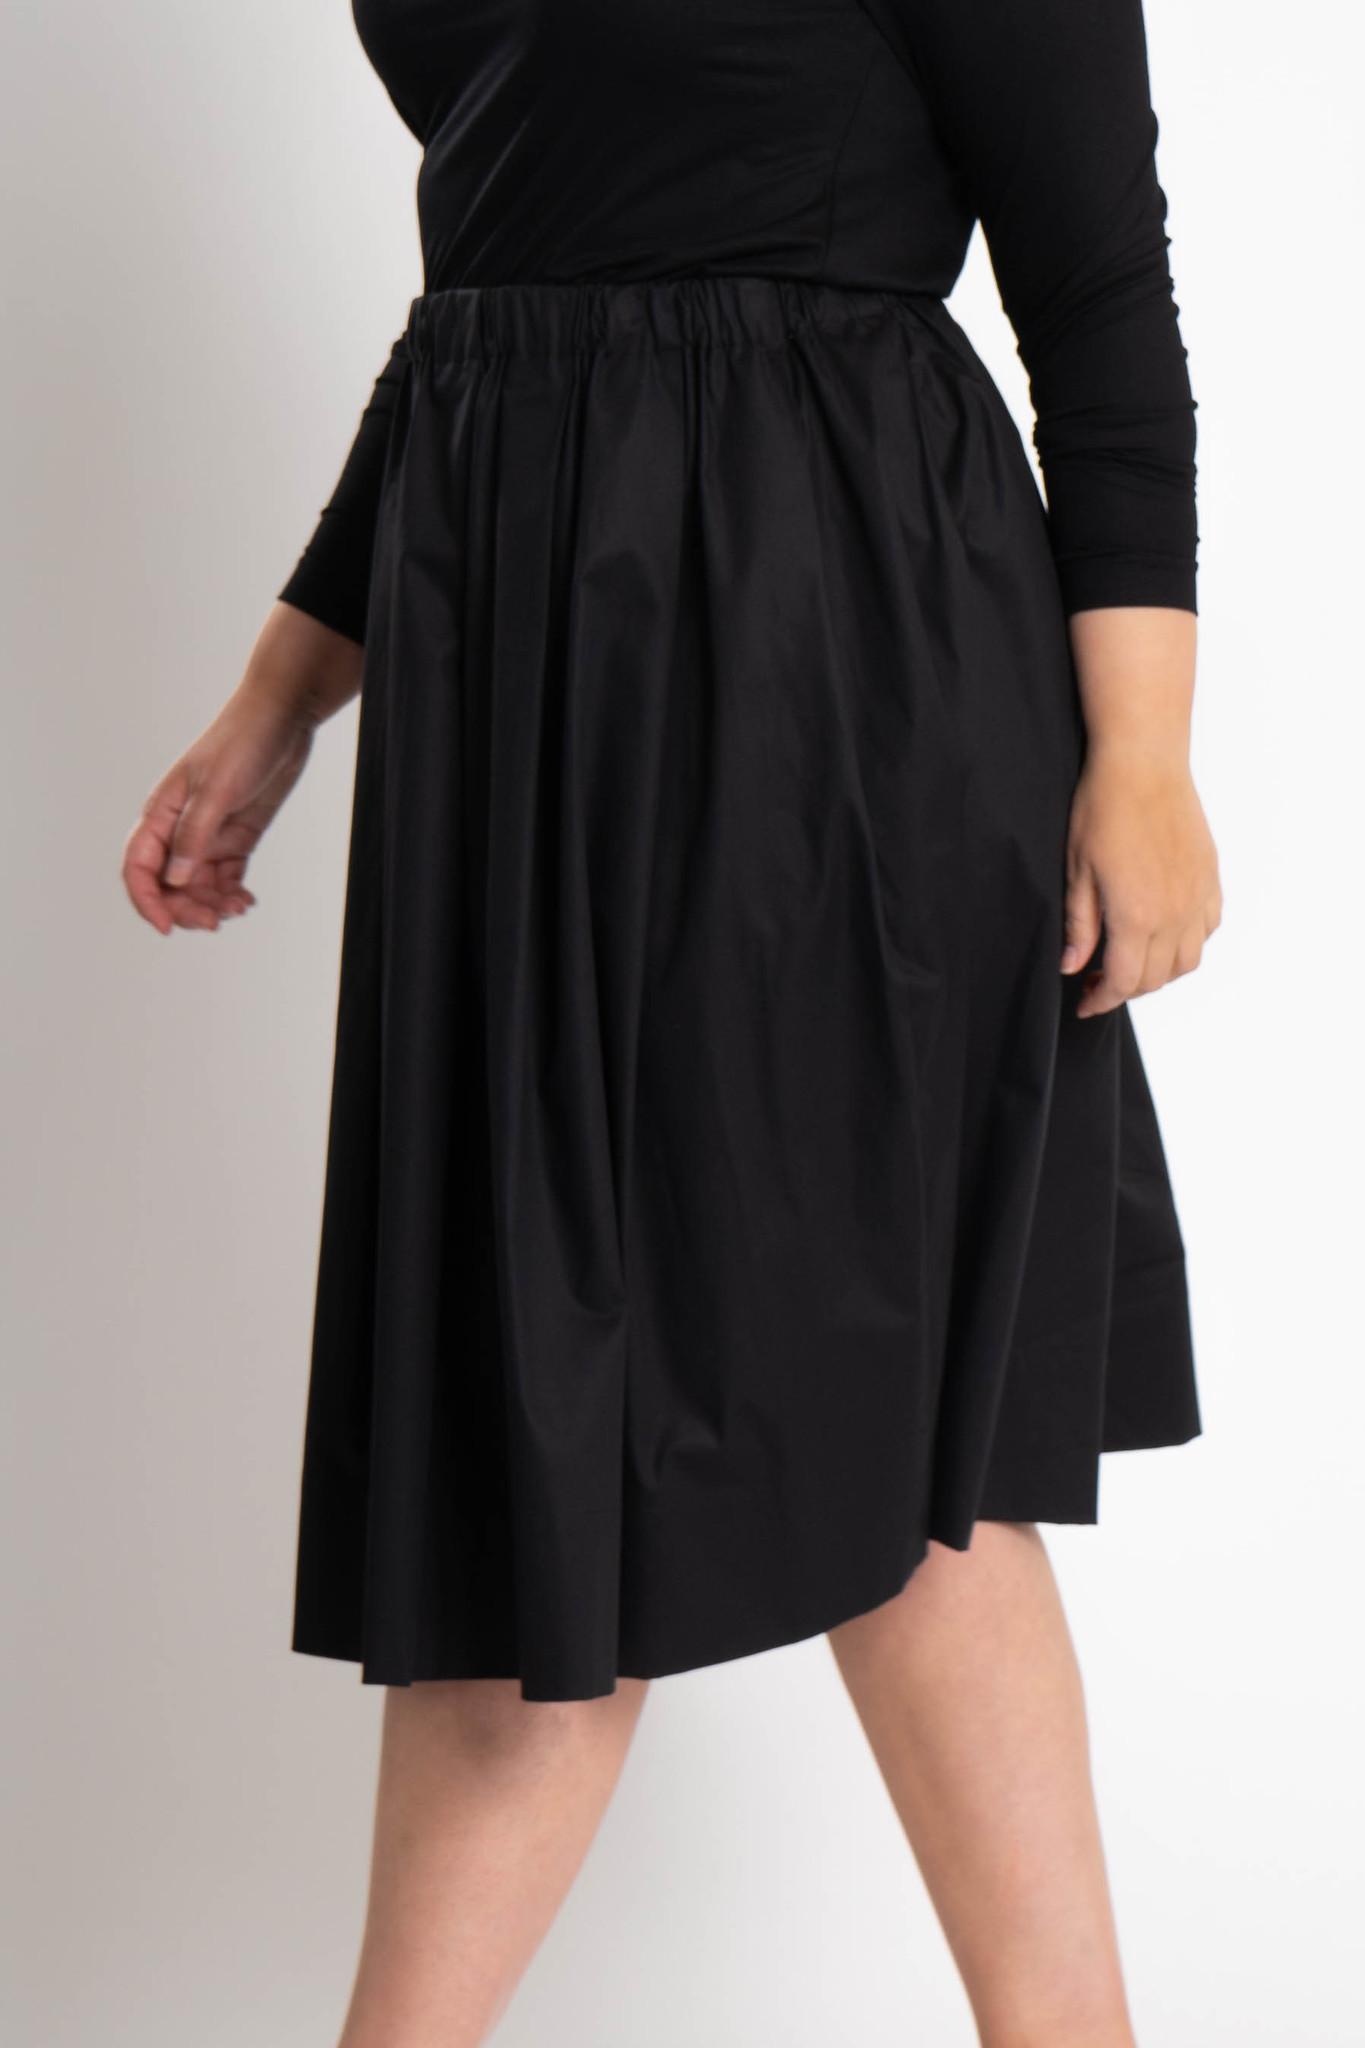 TULIP Skirt in Cotton-7